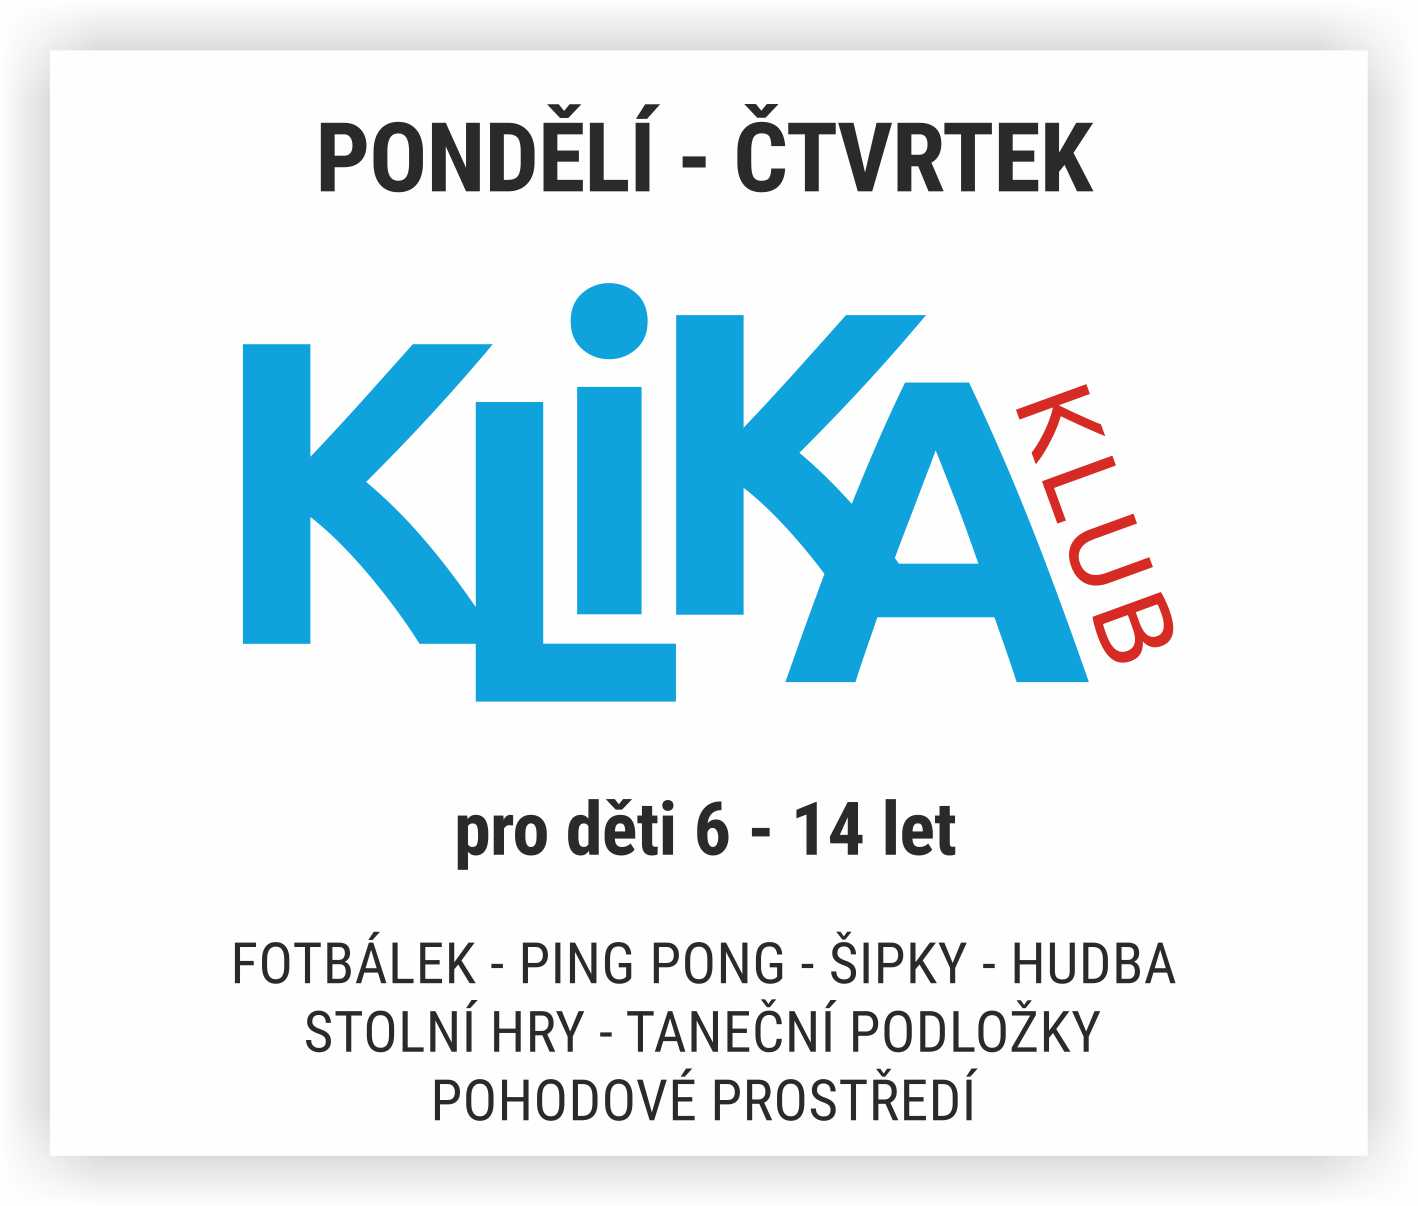 klika_kluby_2018-14hod.jpg